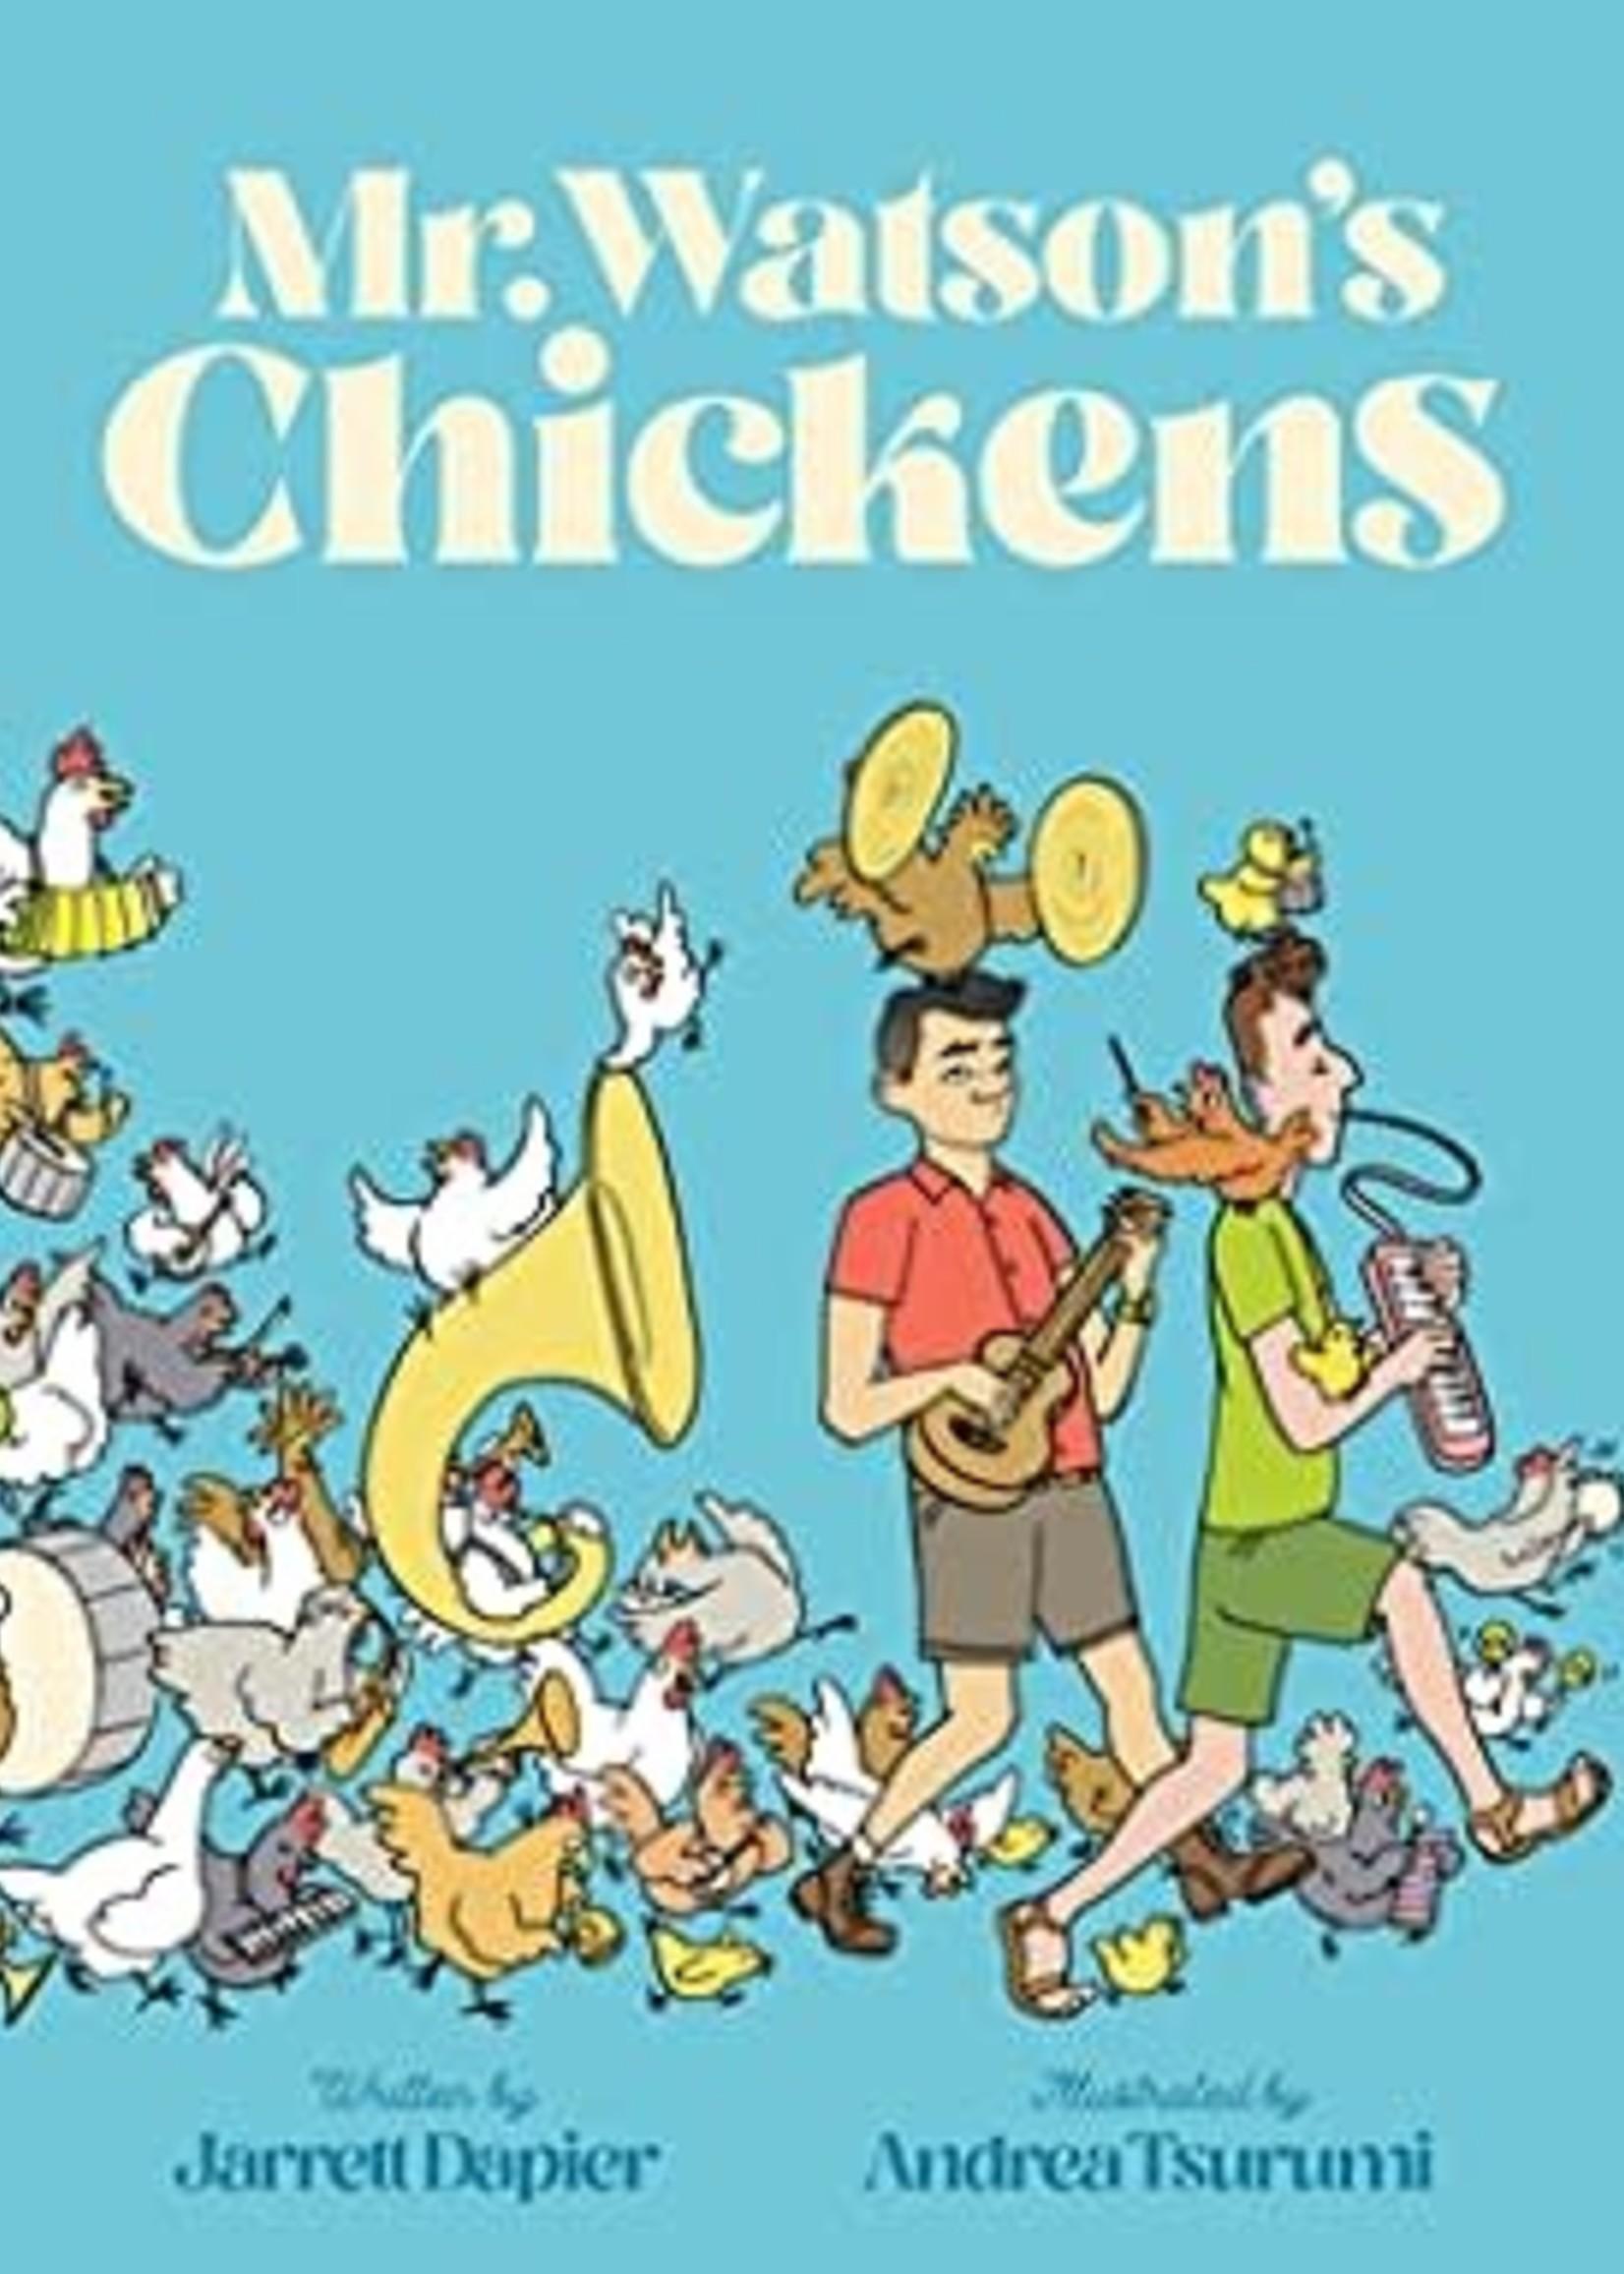 Mr. Watson's Chickens by Jarrett Dapier, Andrea Tsurumi